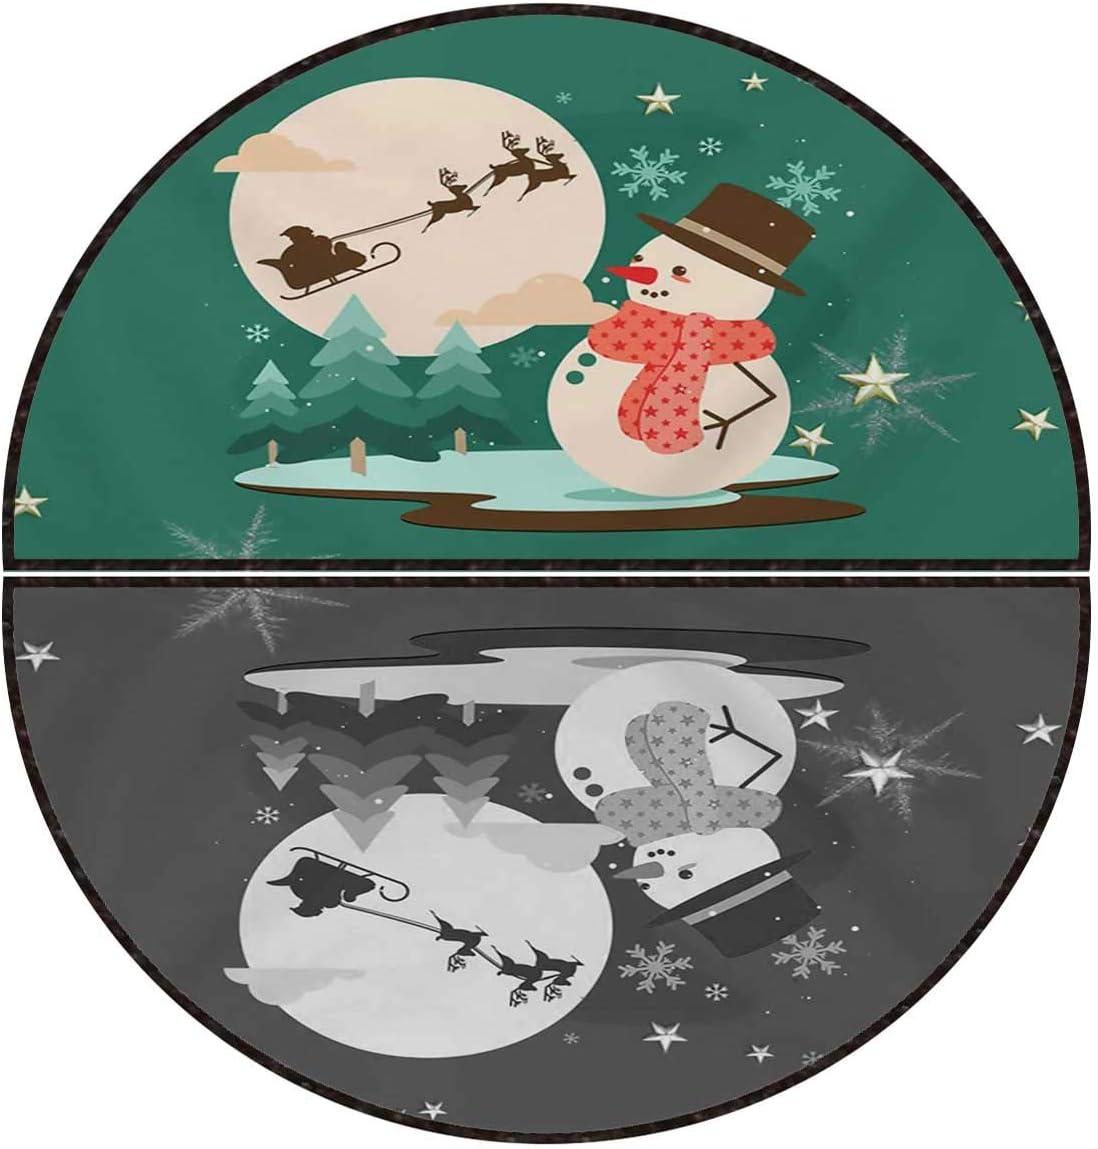 Home Office Floor Mat Green San Antonio Mall Simple Snowman Decoration Christmas Quantity limited